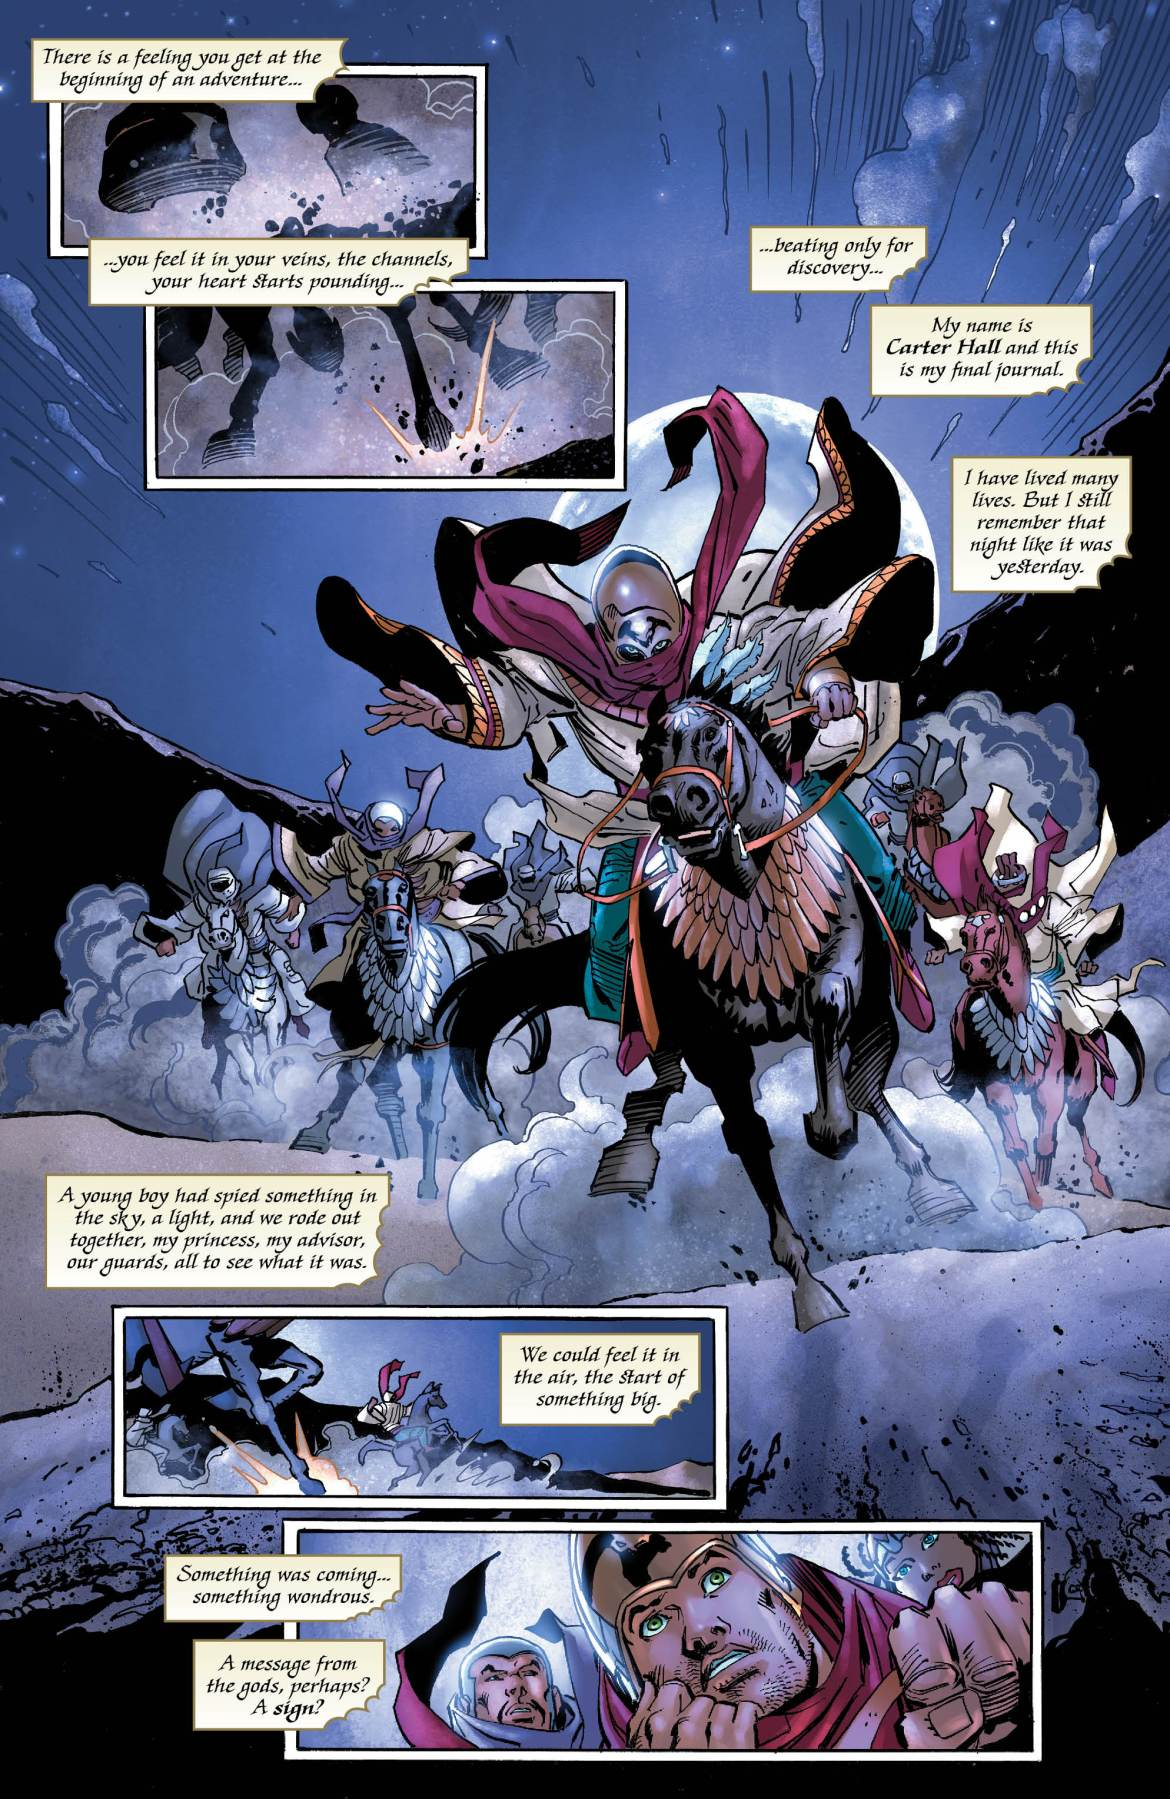 Dark Days The Forge 1 -DC Comics News